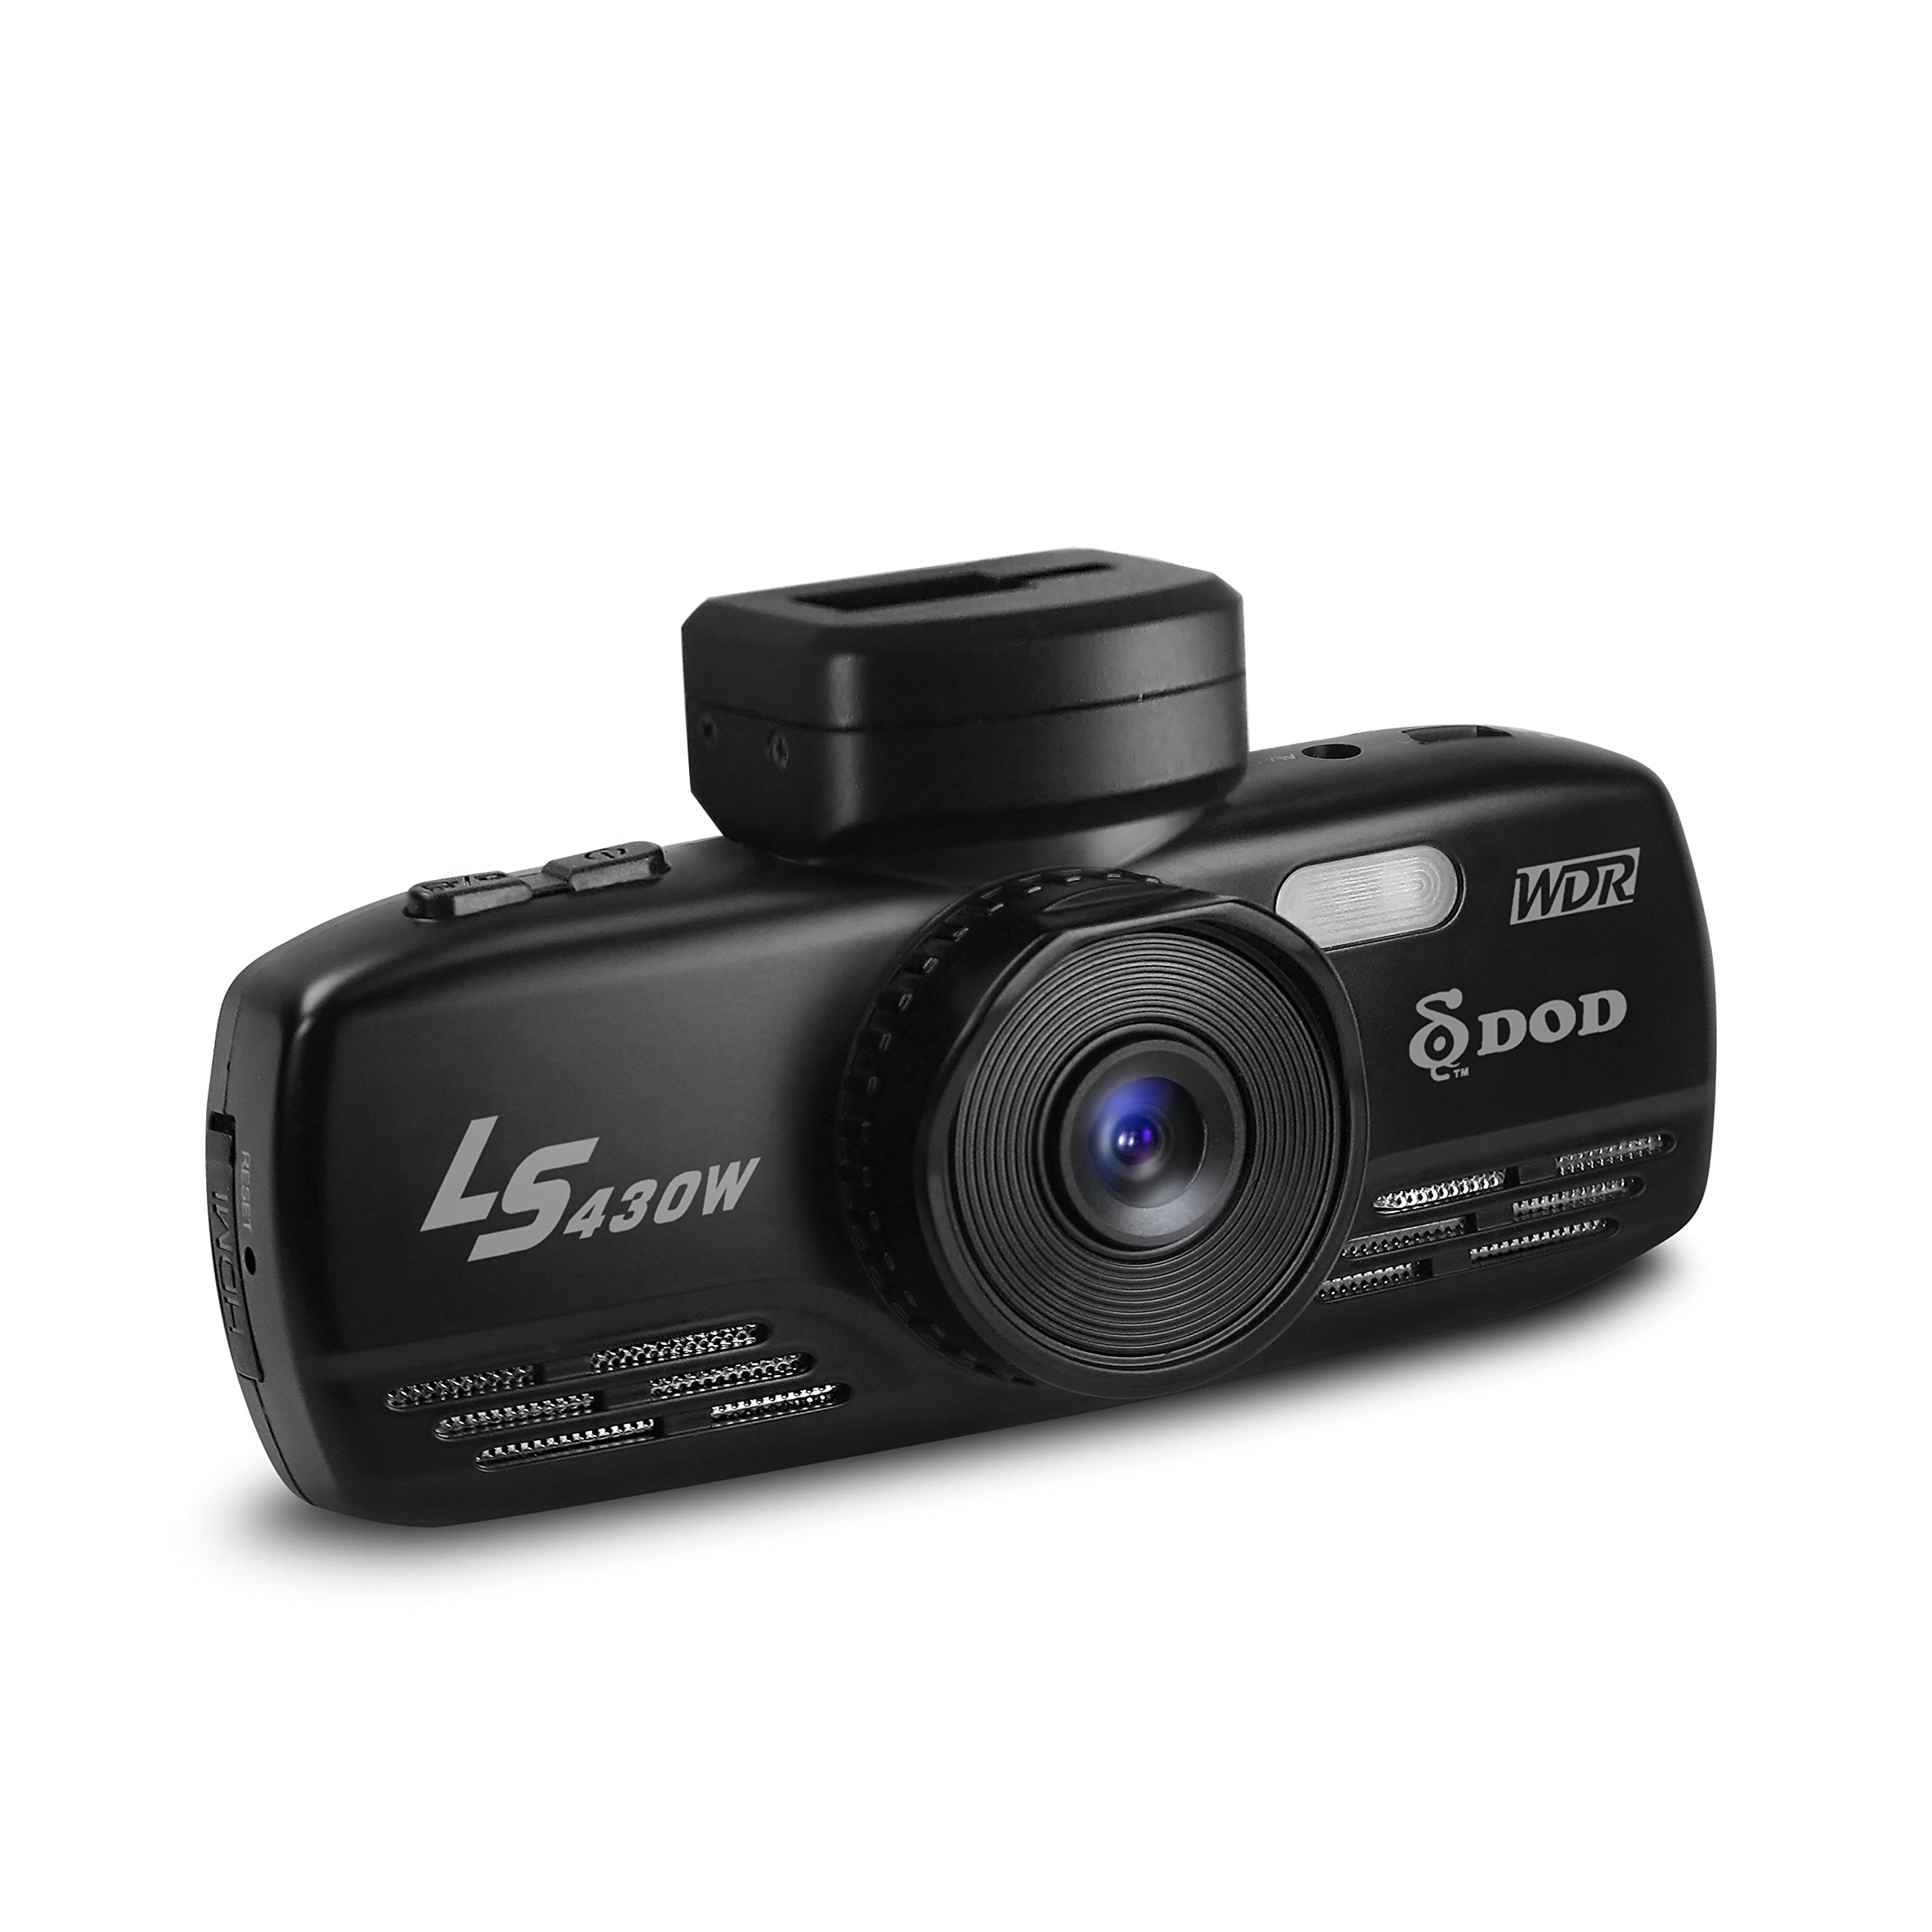 DOD TECH LS430W LS Series, 1080P Dash Camera, 5Hz GPS, Japanese Lens, Large f/1.6 Aperture